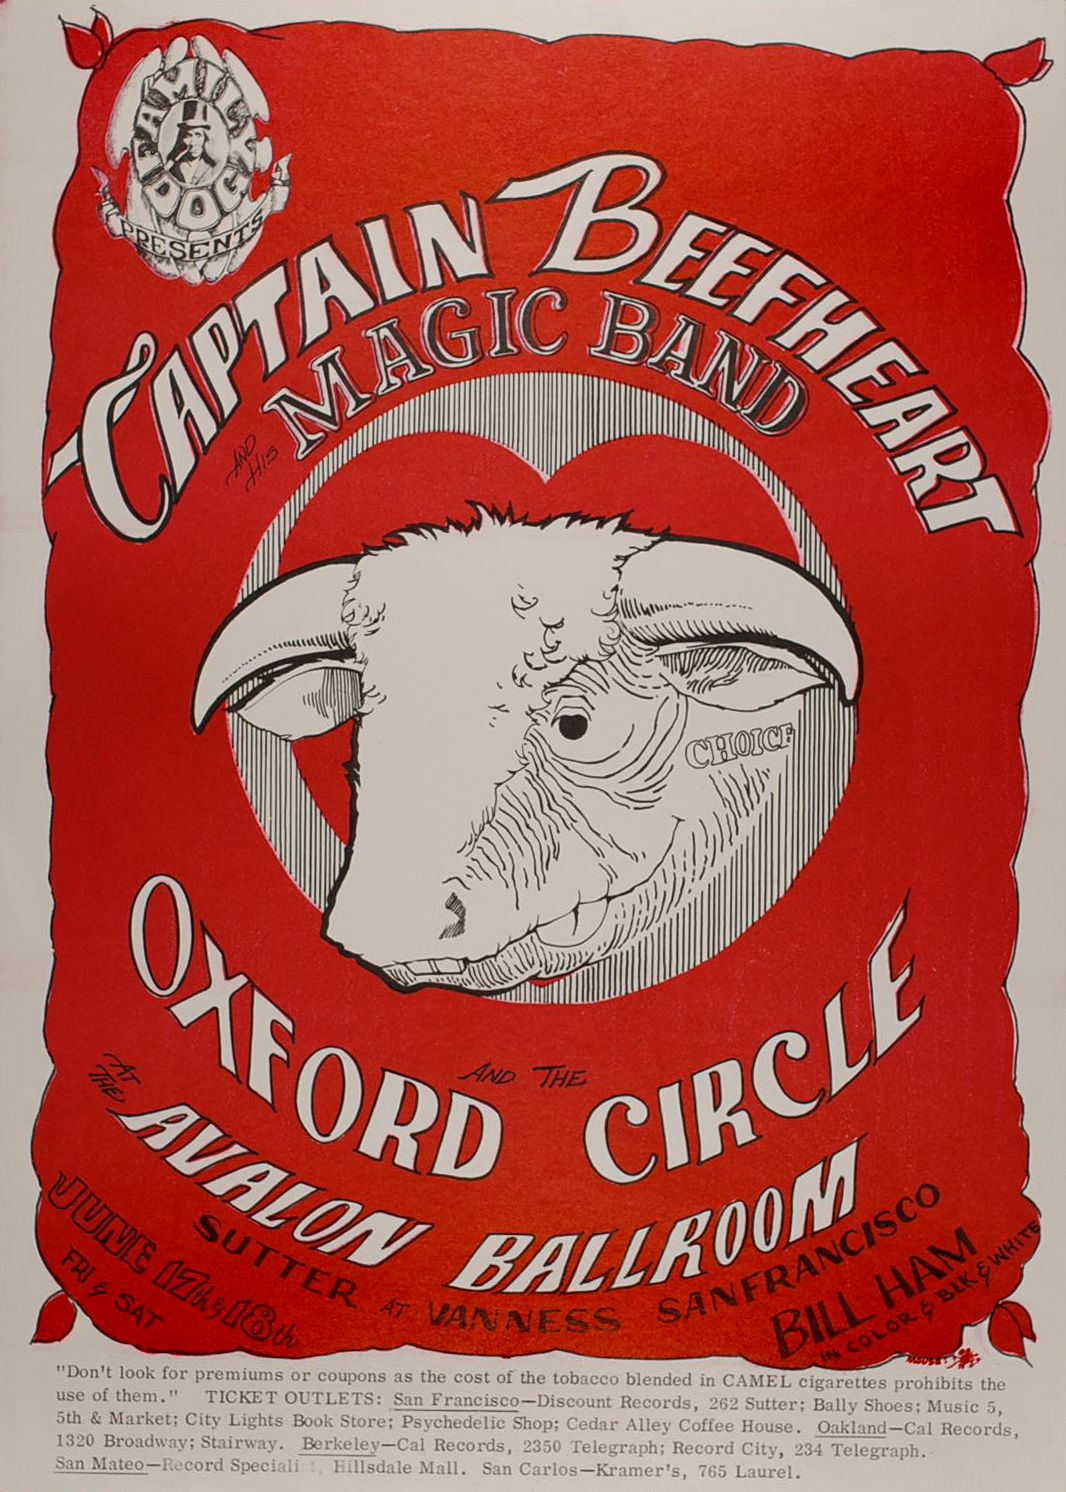 17.-.18.6.1966; captain beefheart and his magic band; usa, s.f. avalon ballroom; (db)